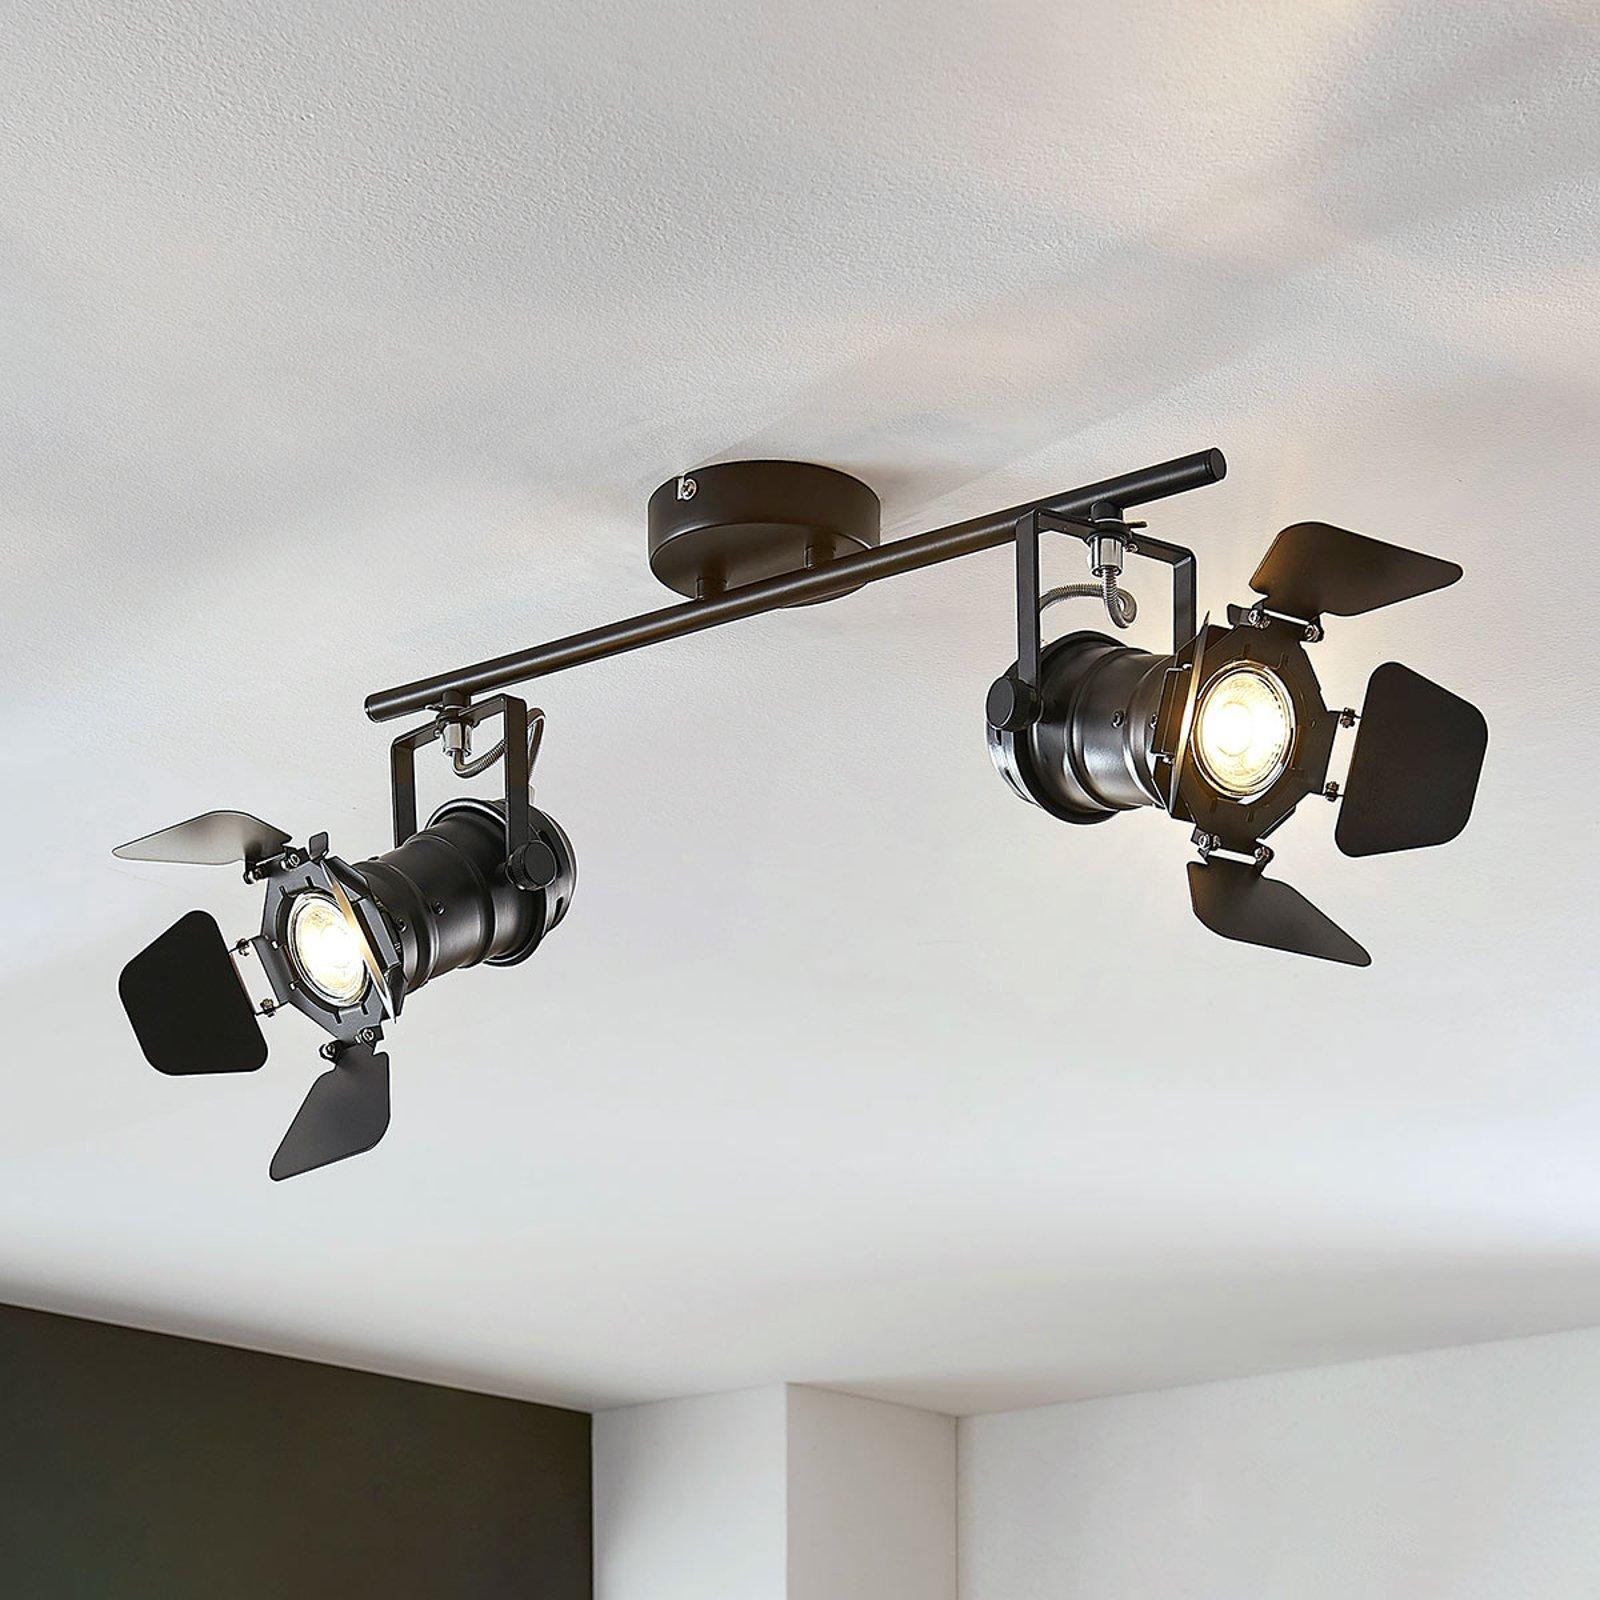 Taklampe Tilen, 2 lyskilder, lyskasterdesign